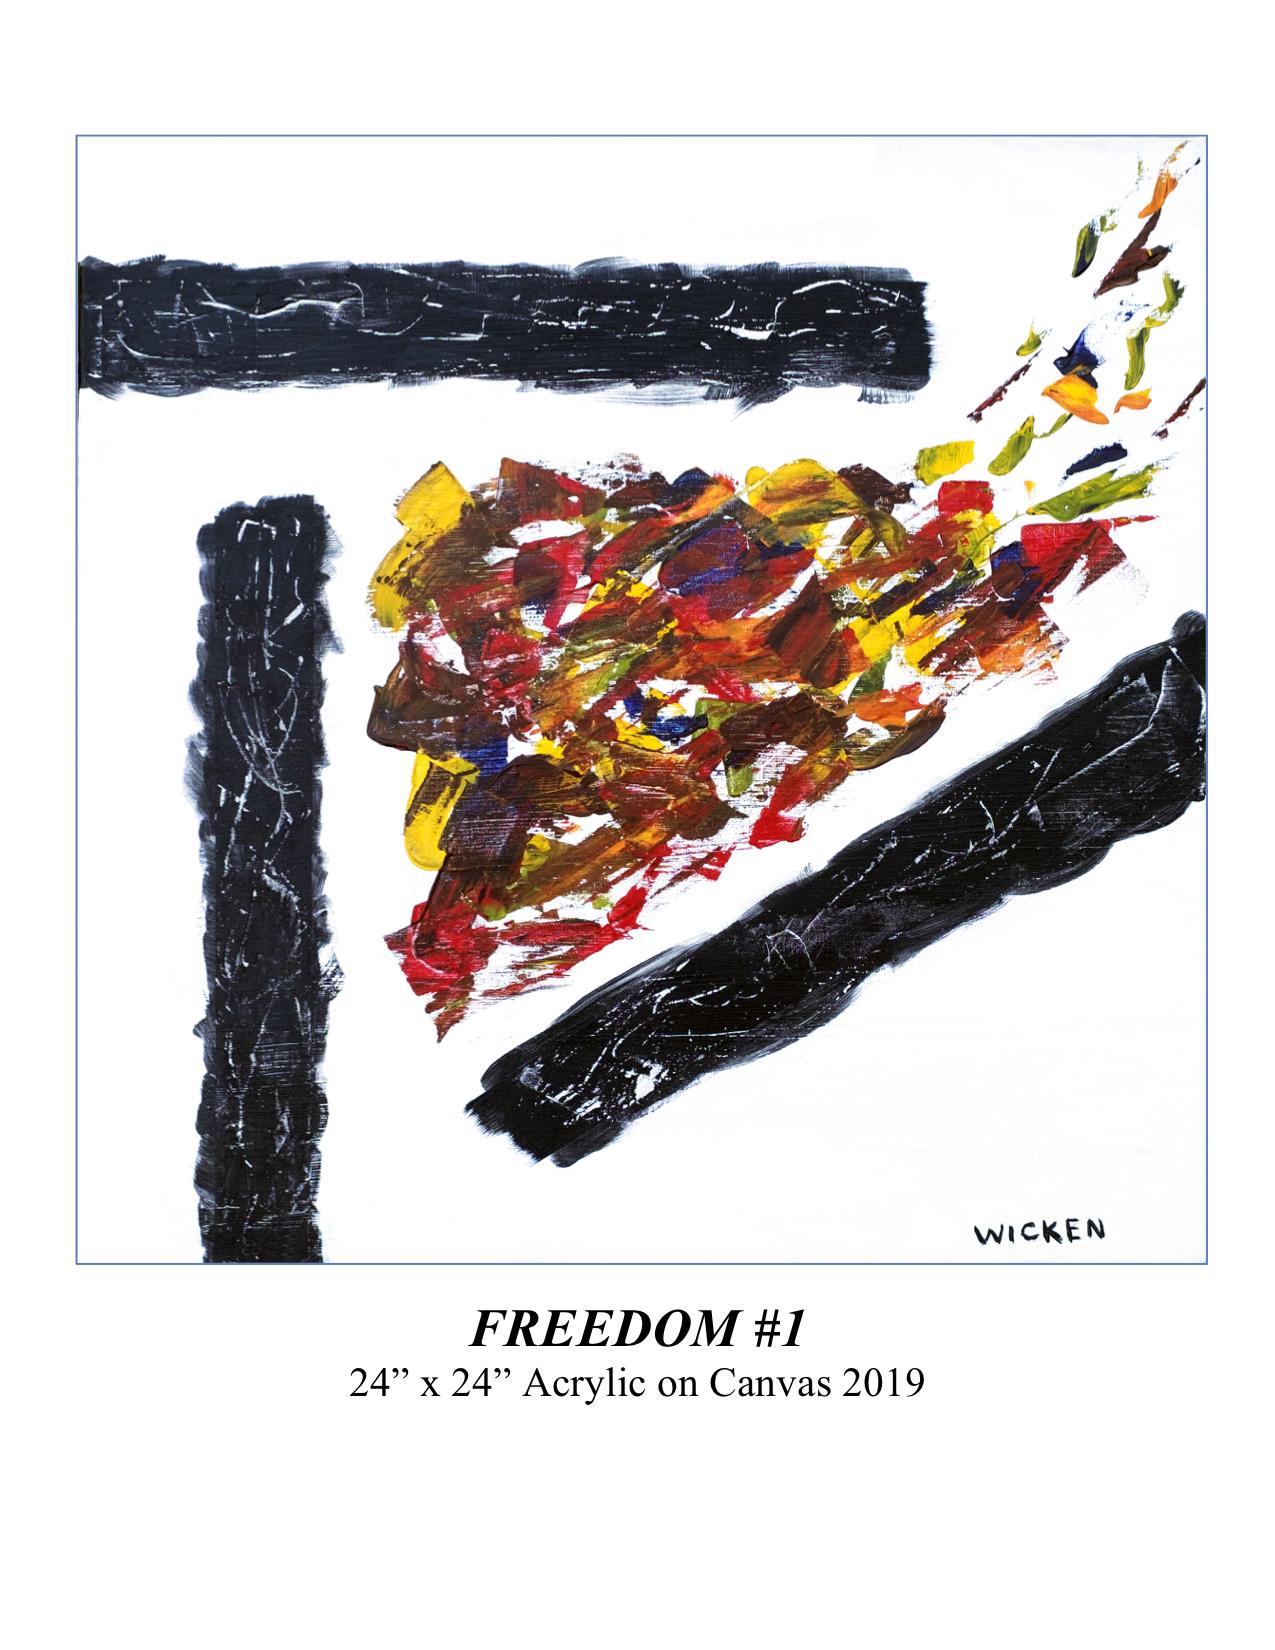 FREEDOM #1 0014.jpg